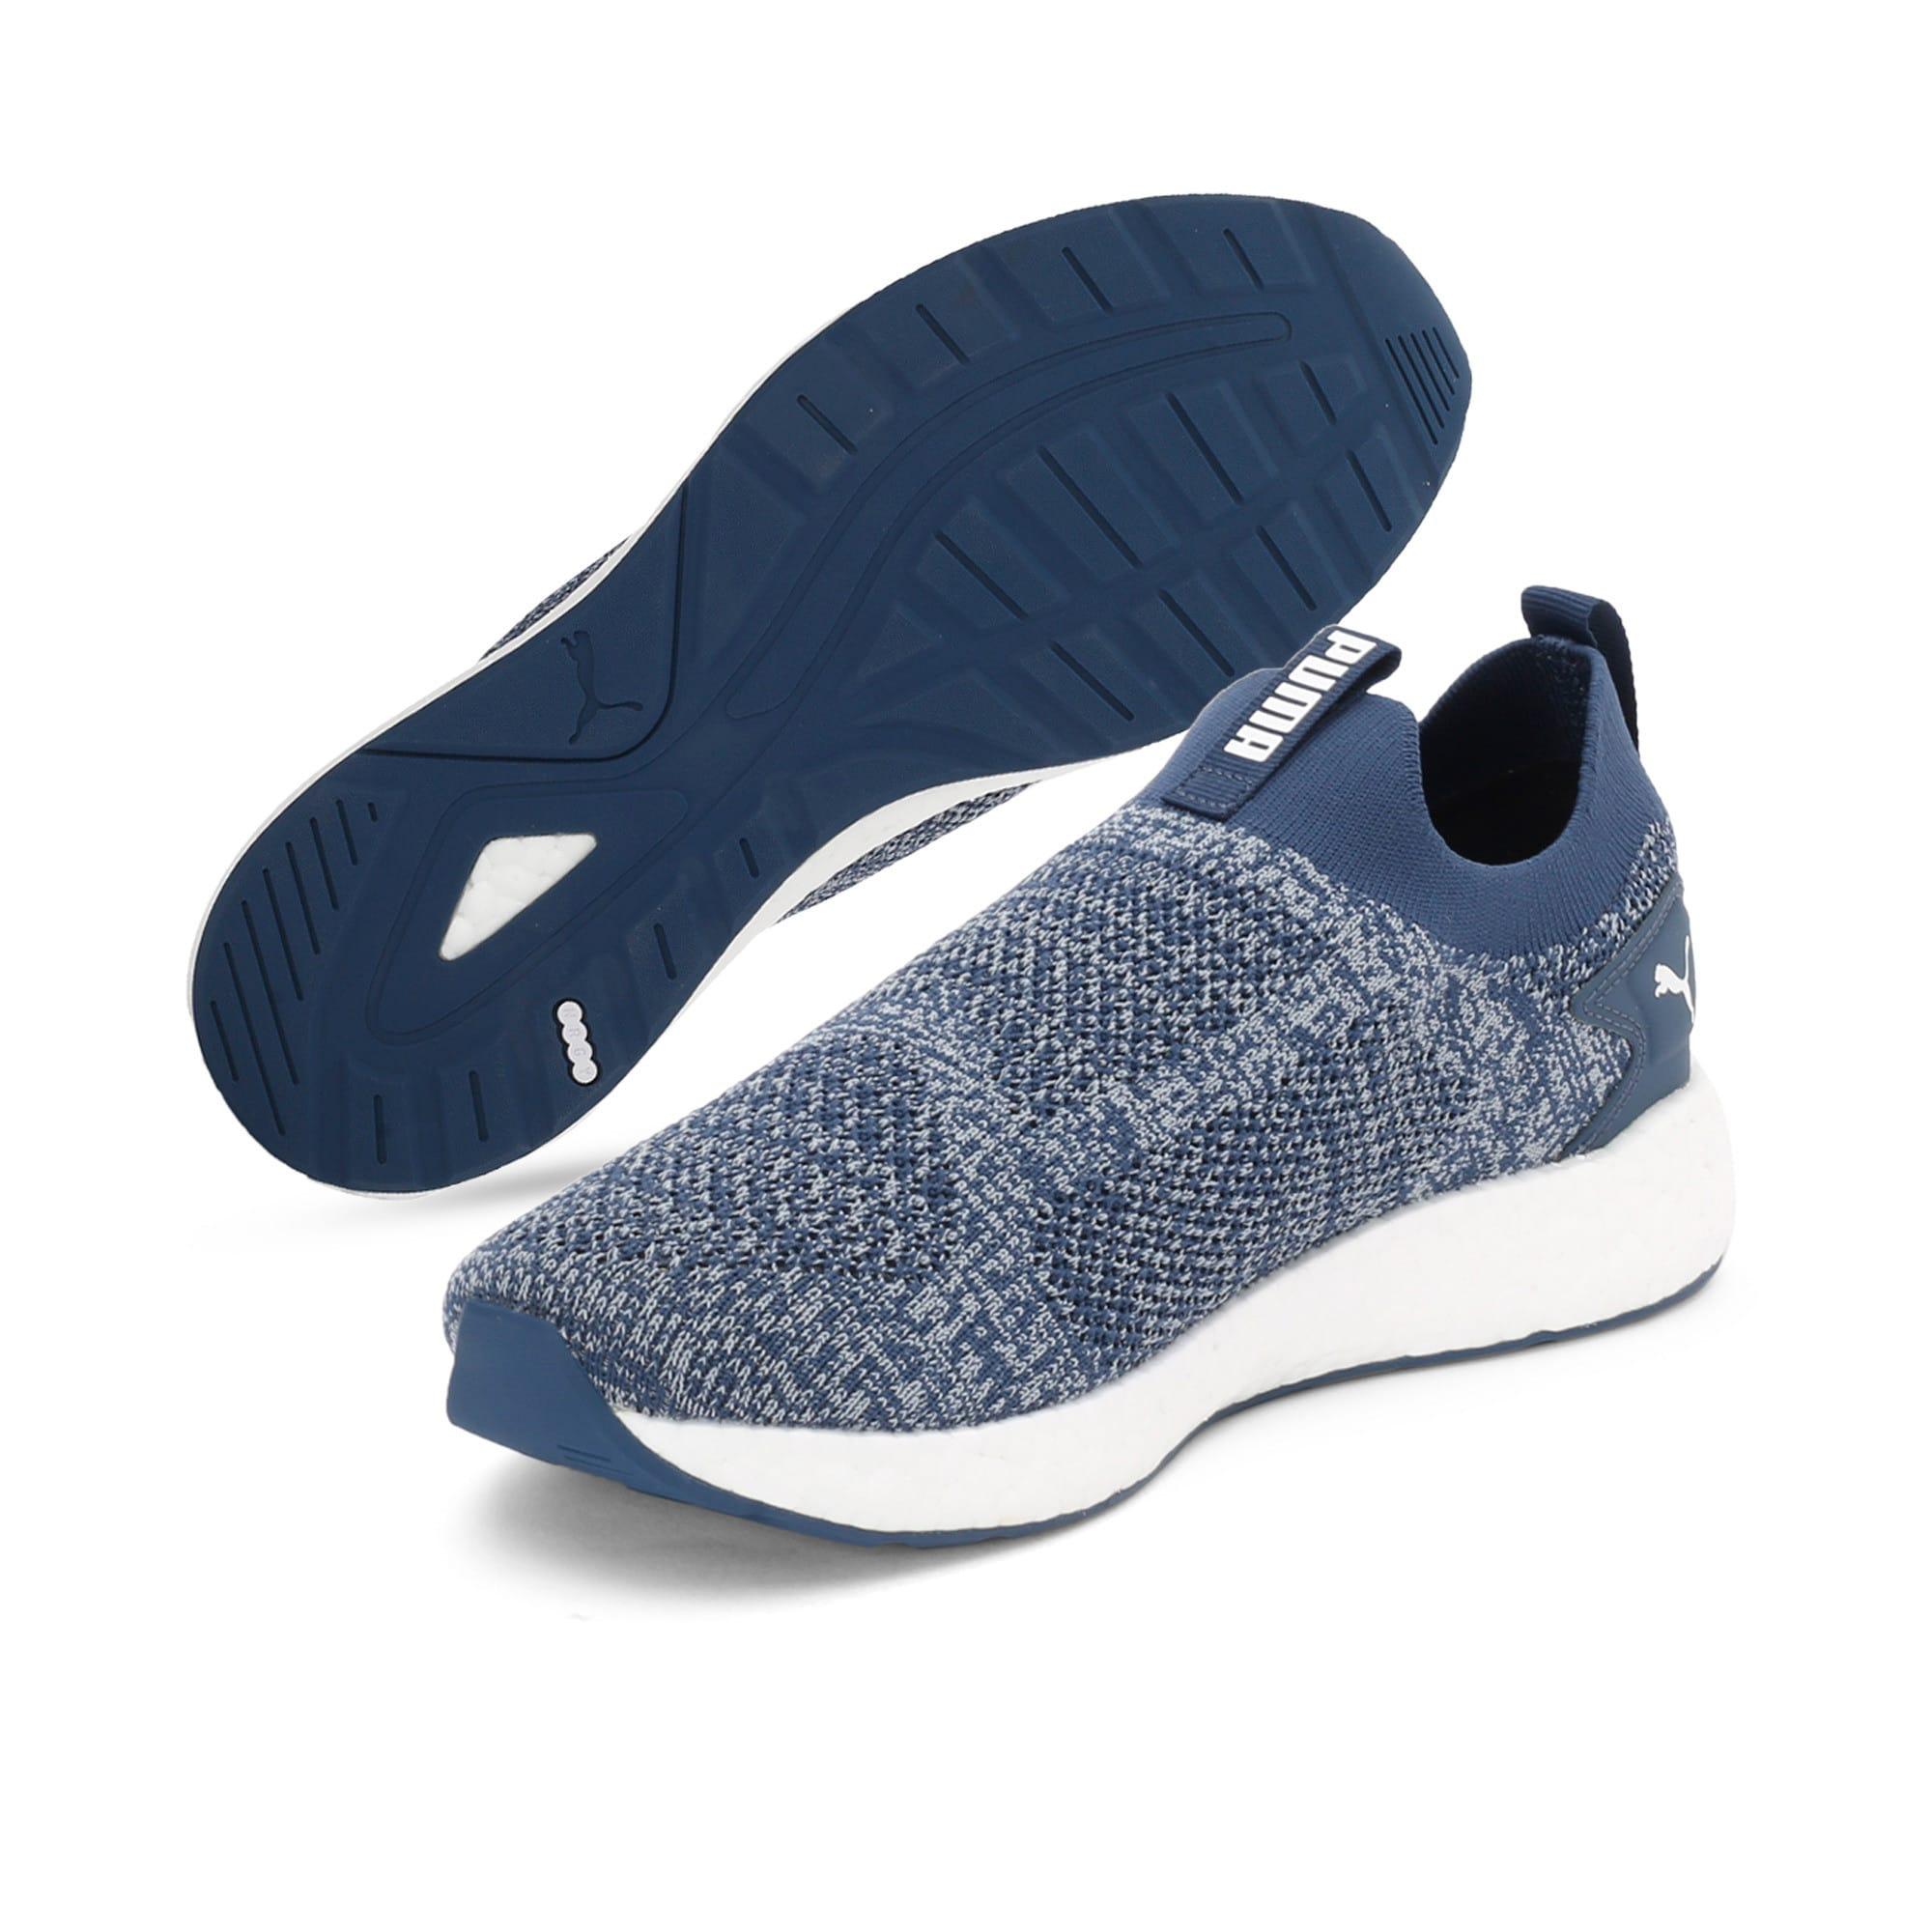 Thumbnail 2 of NRGY Neko Slip-On one8 Unisex Running Shoes, Dark Denim-Puma White, medium-IND